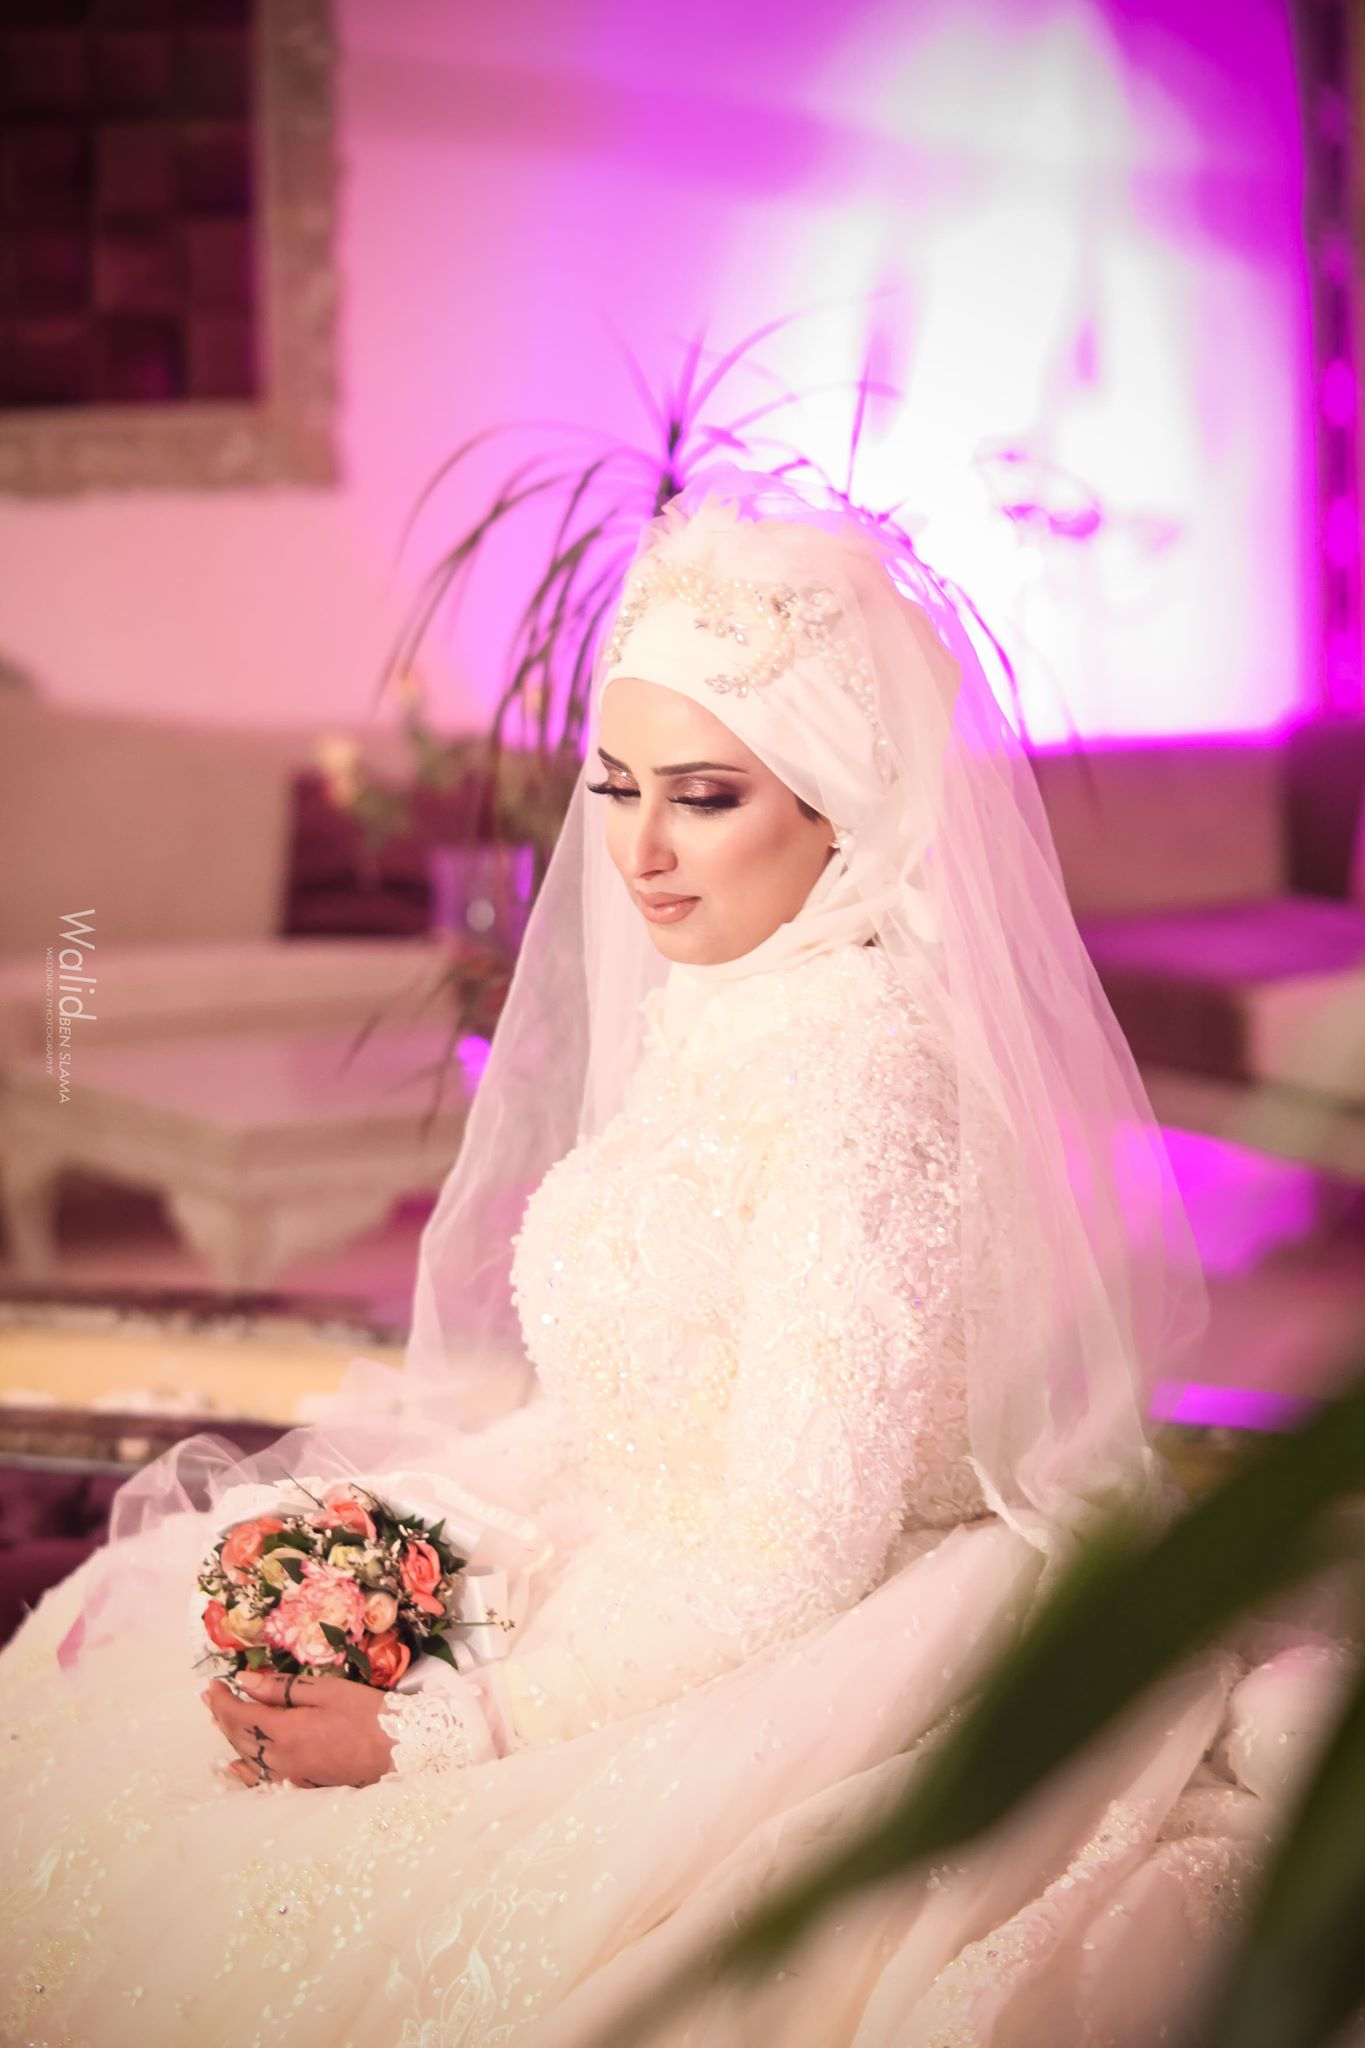 Tesnim_M6_plus_belles_mariées_tunisiennes2019